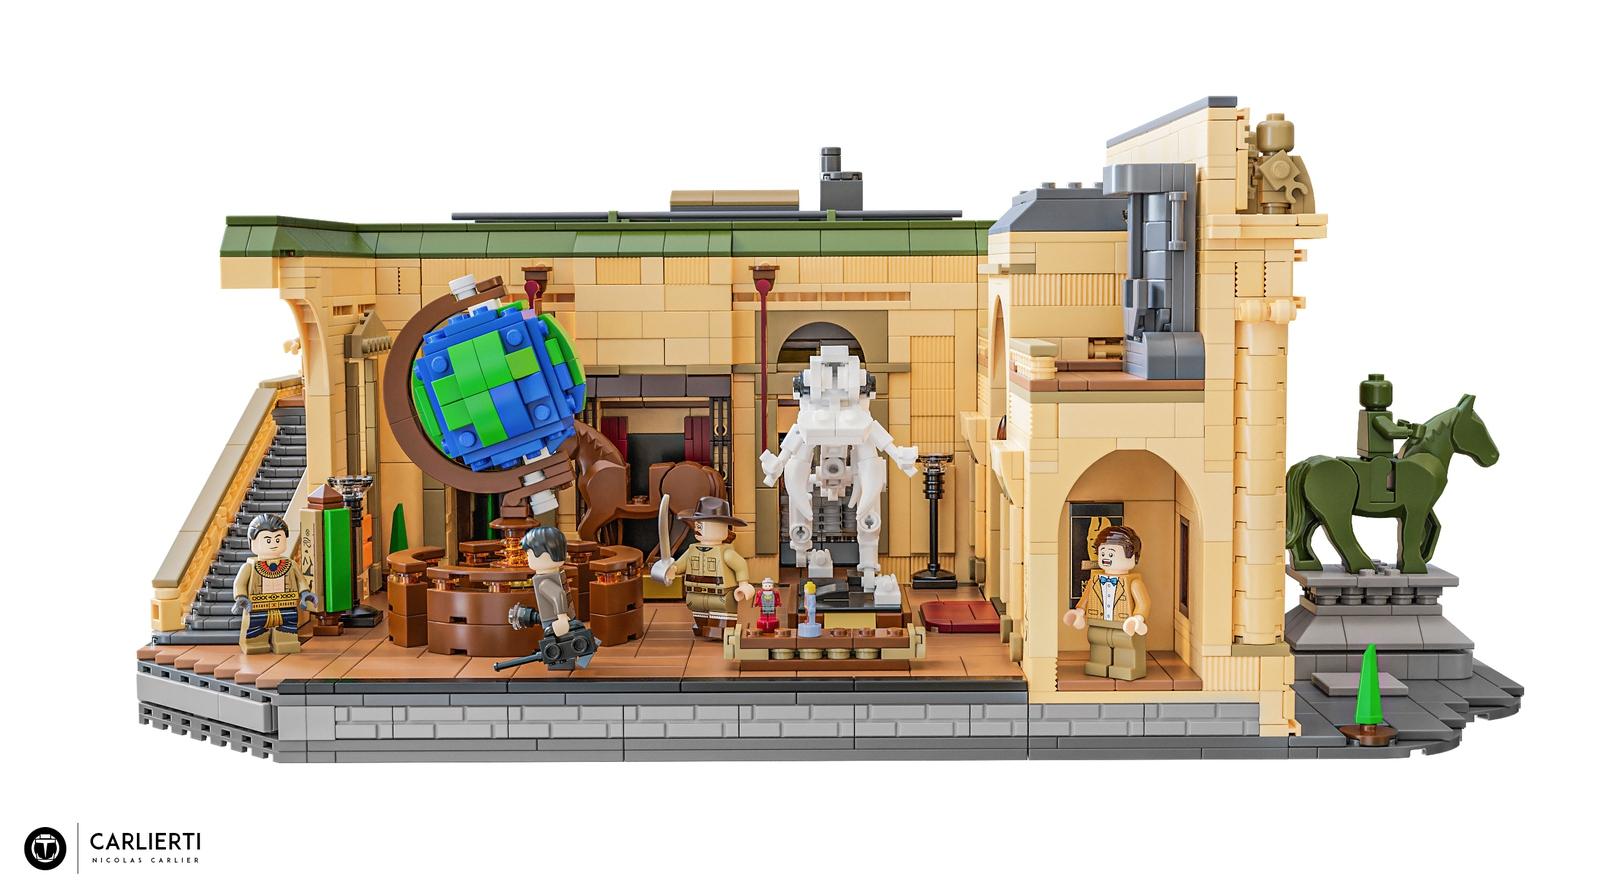 lego-ideas-night-at-the-museum-carlieri-3 zusammengebaut.com